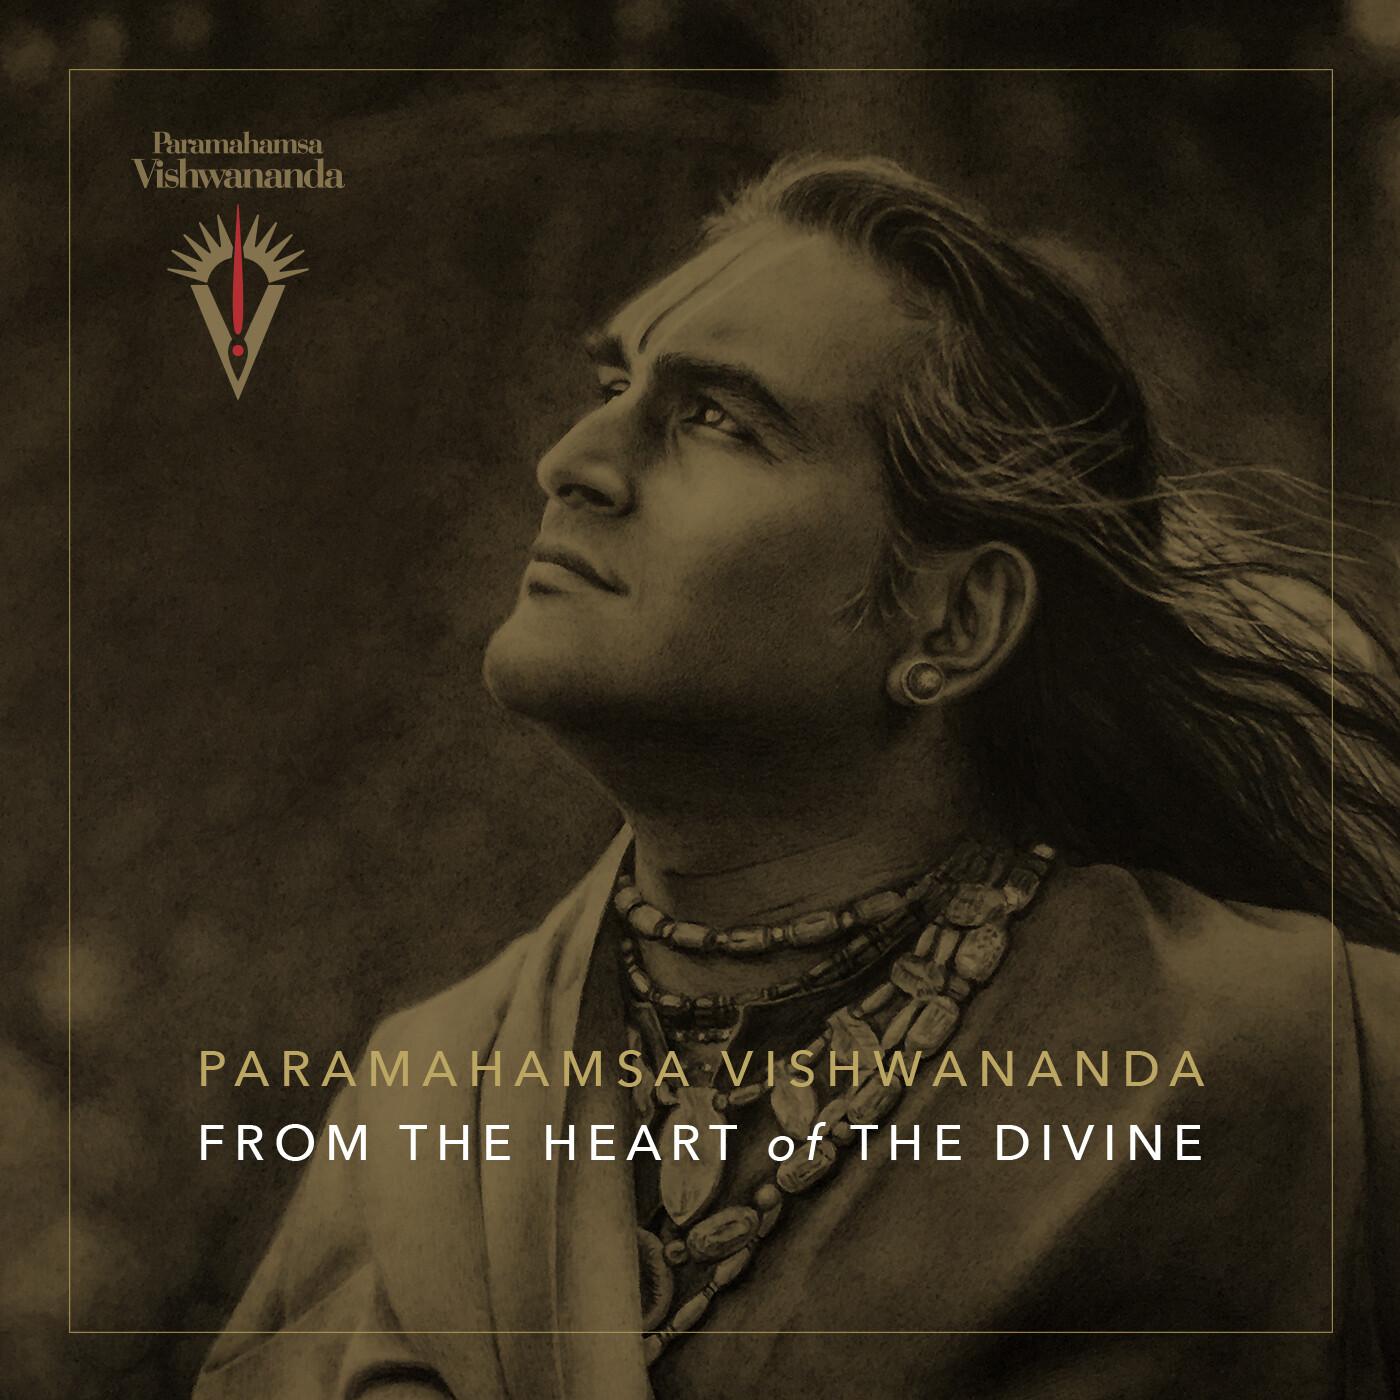 Paramahamsa Vishwananda: From the Heart of the Divine